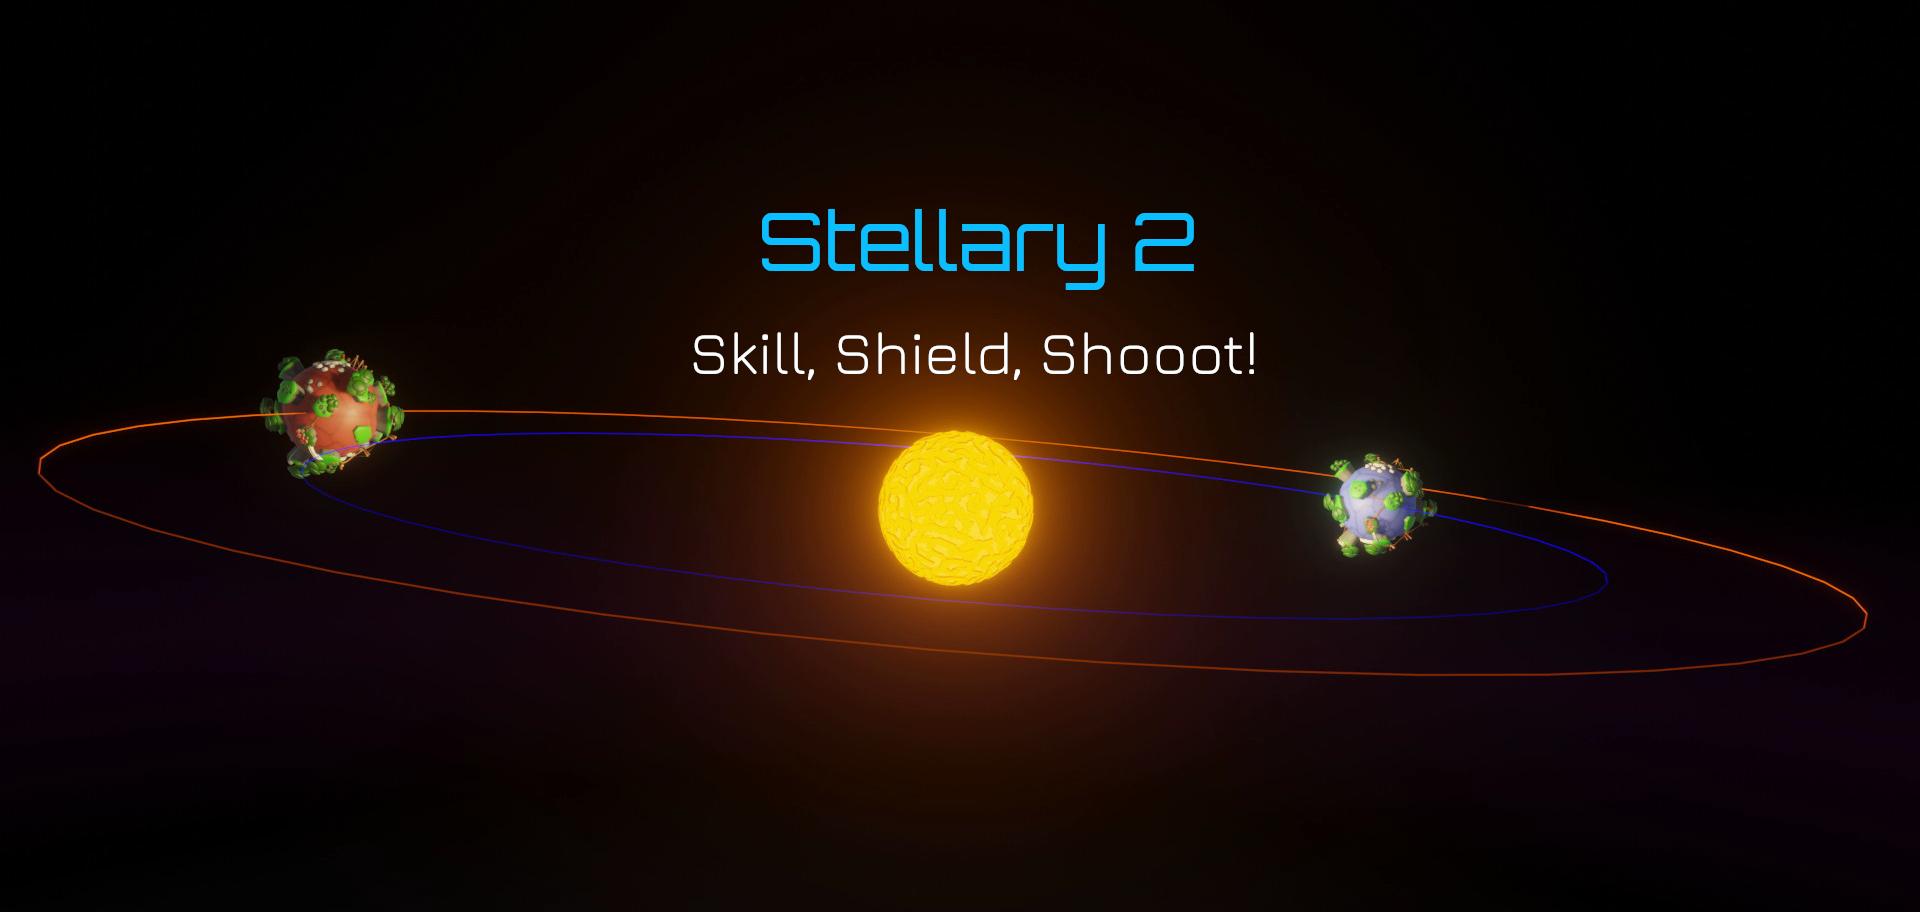 Stellary 2 Banner